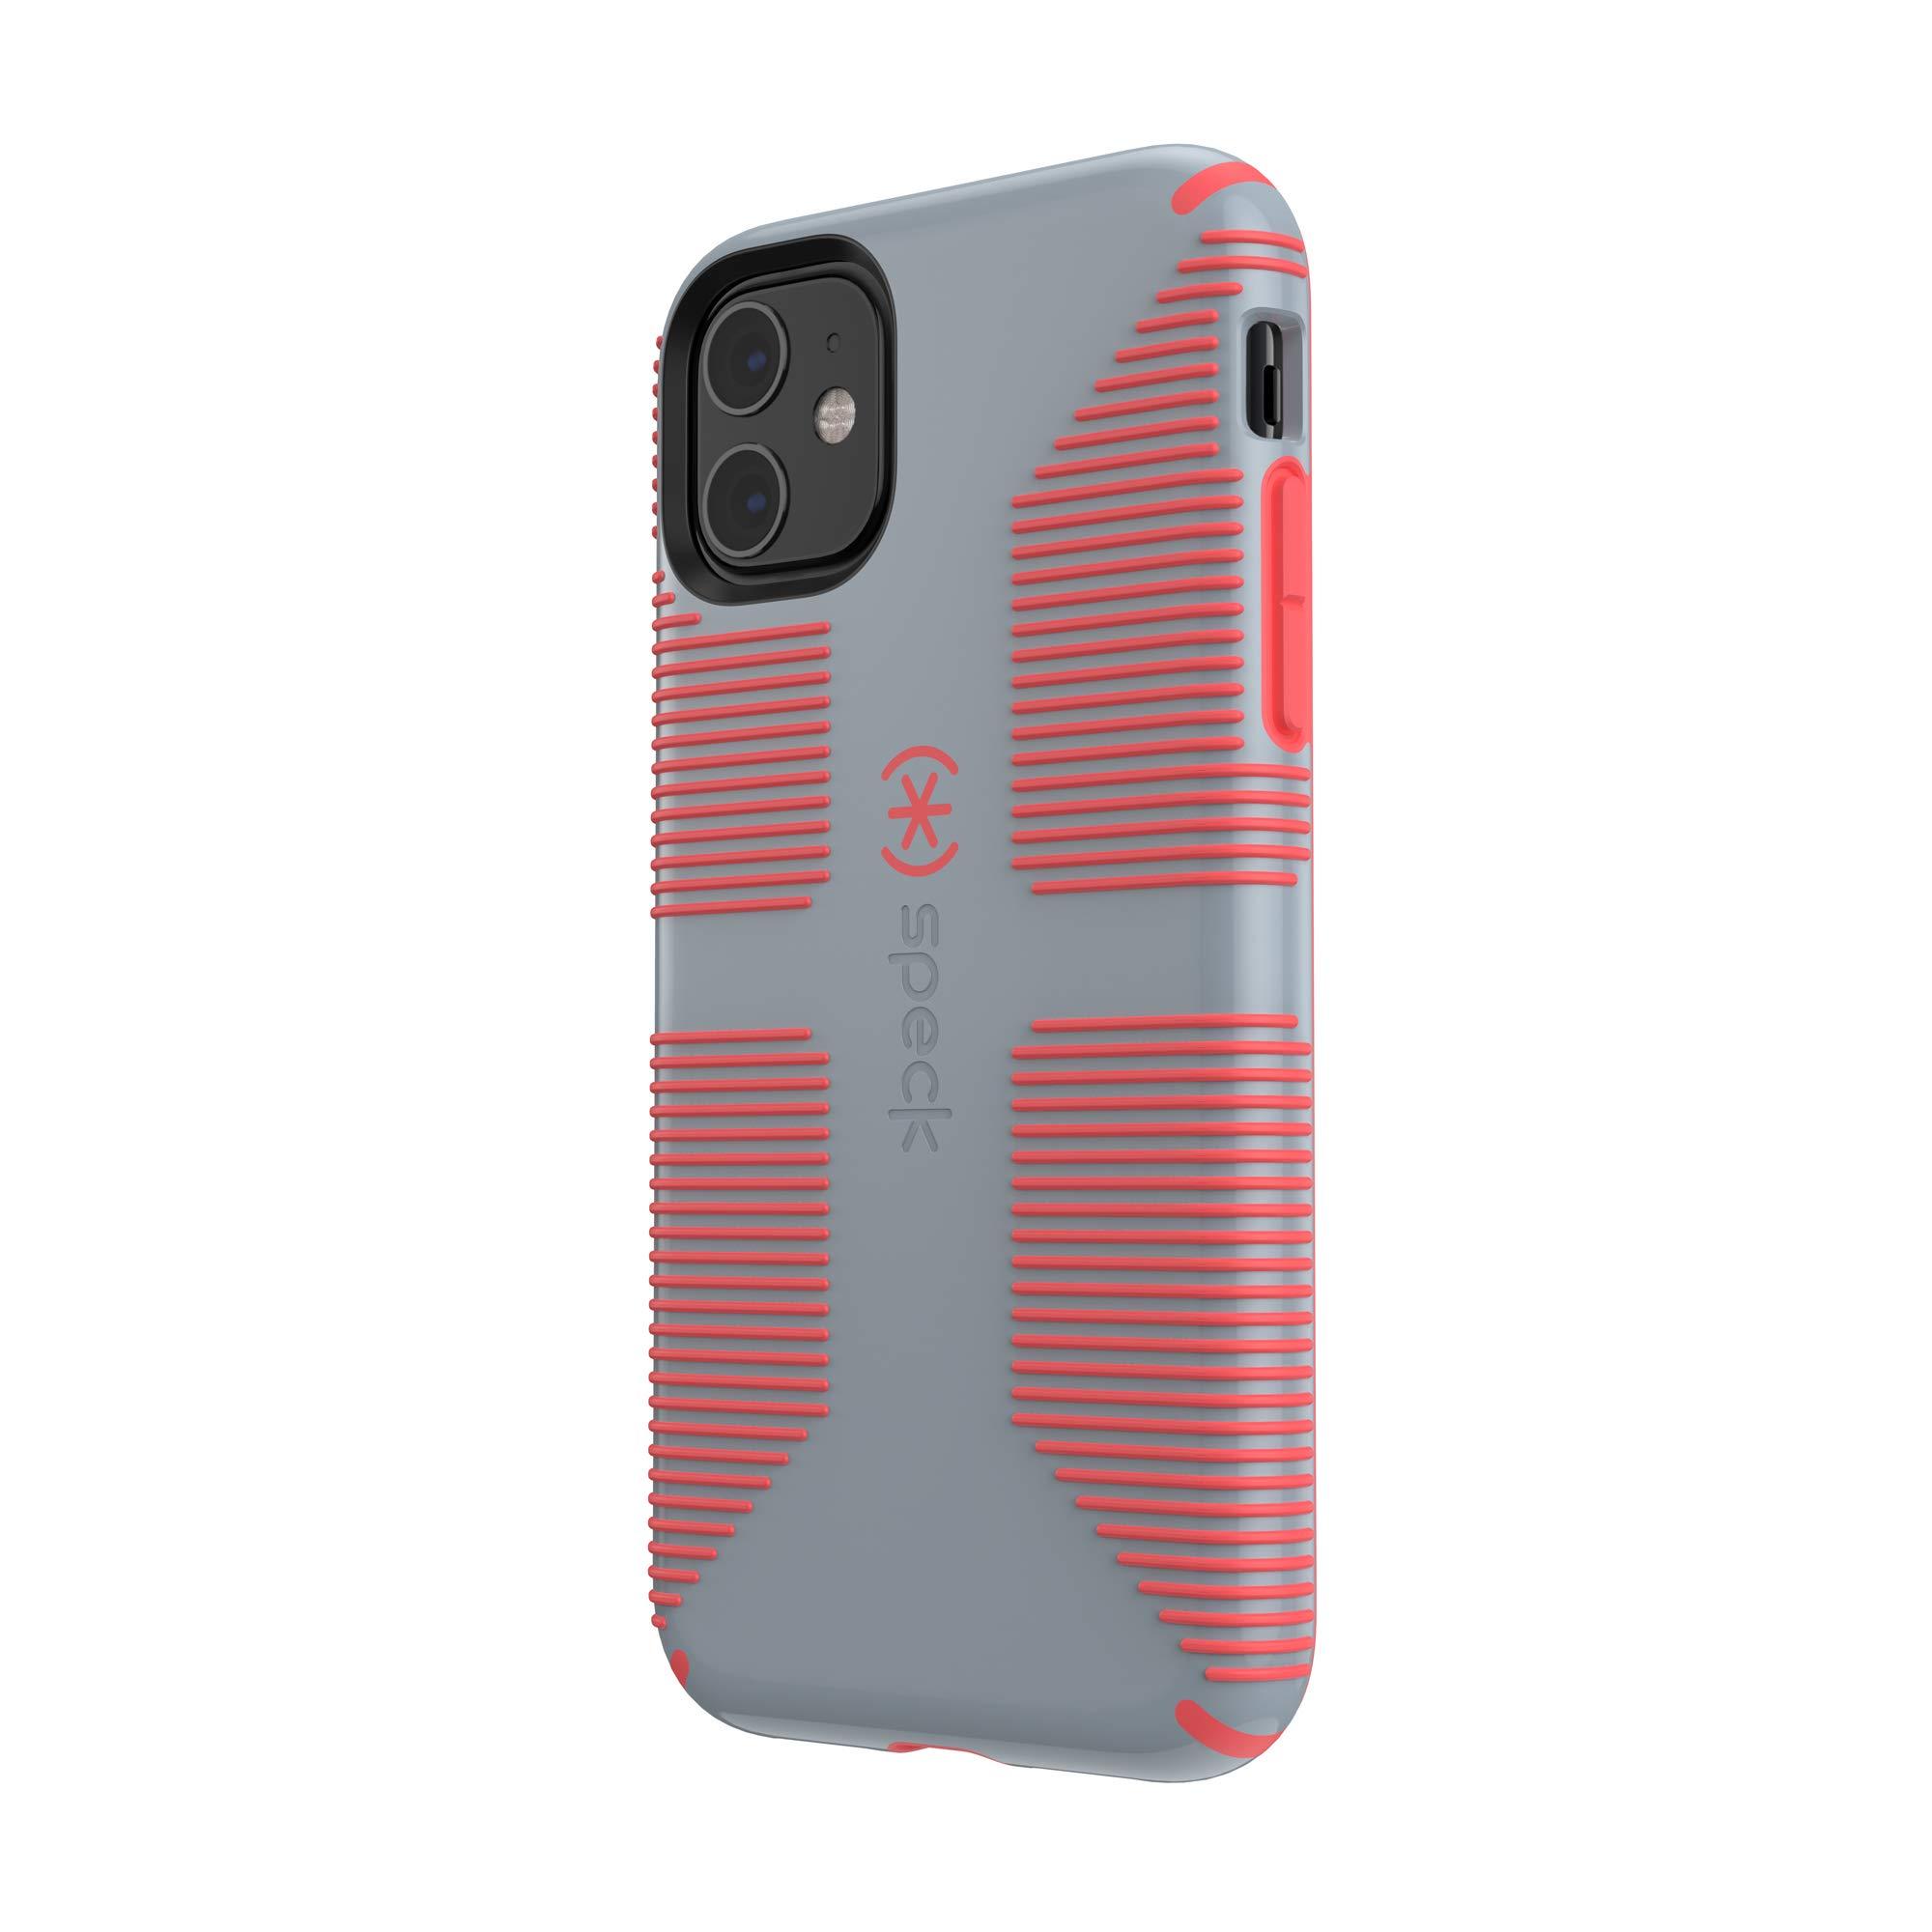 Speck CandyShell Grip iPhone 11 Case, Nickel Grey/Warning Orange